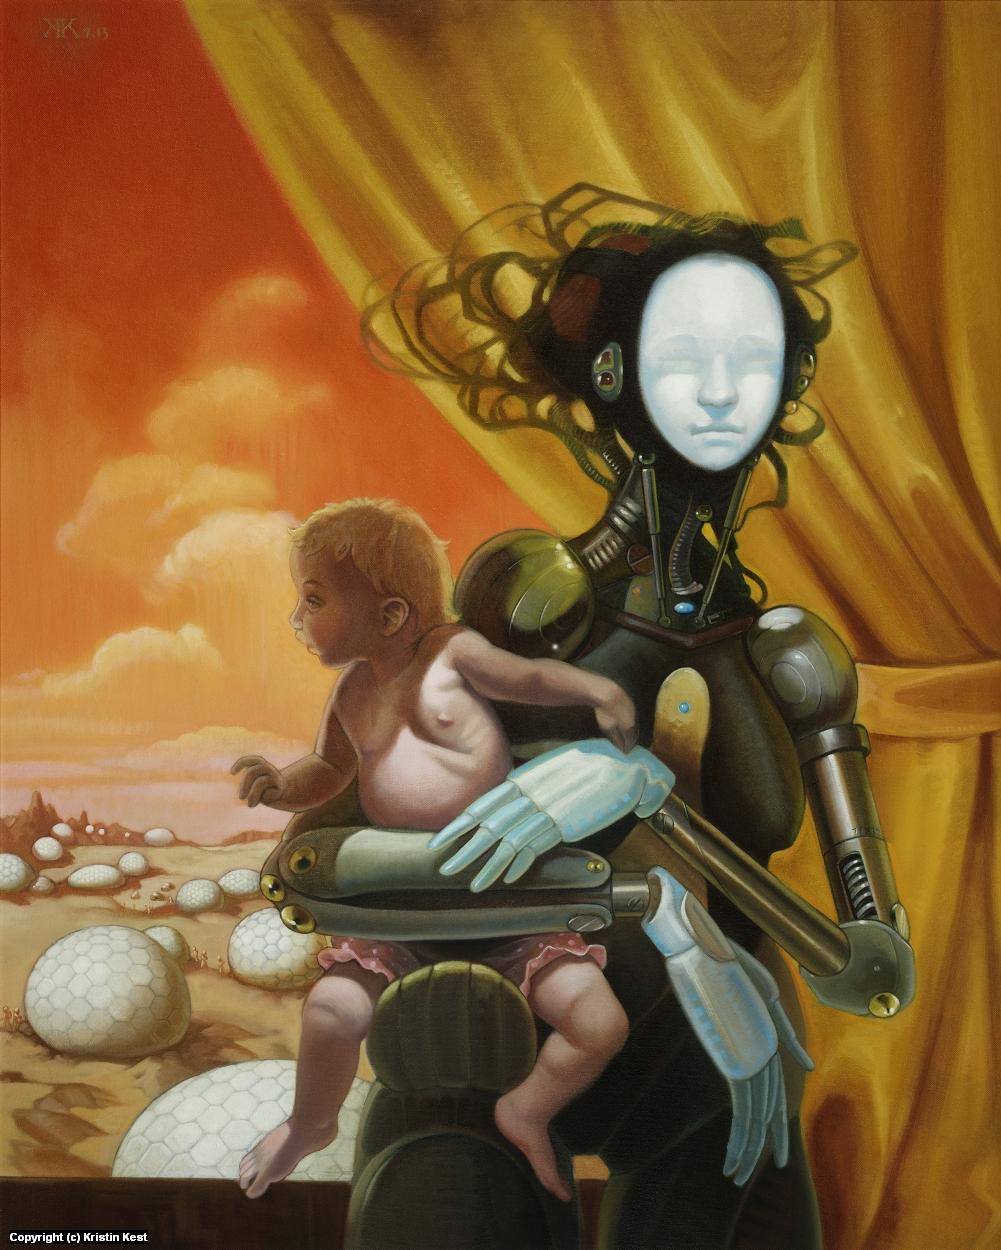 Ma.1Donna Artwork by Kristin Kest